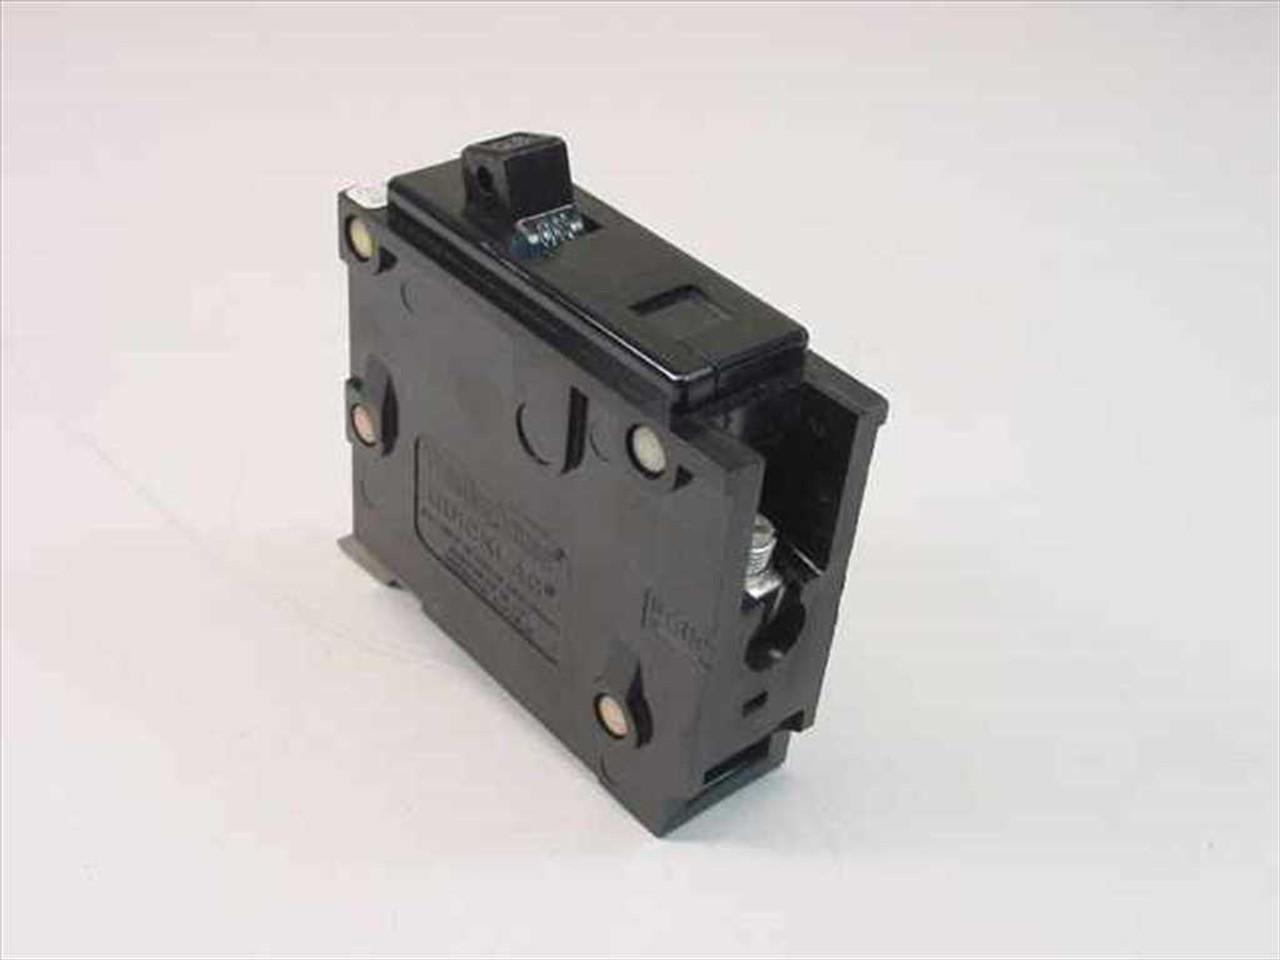 westinghouse mj 1588 type ba 1 pole 15 amp circuit breaker recycledgoods com [ 1024 x 768 Pixel ]